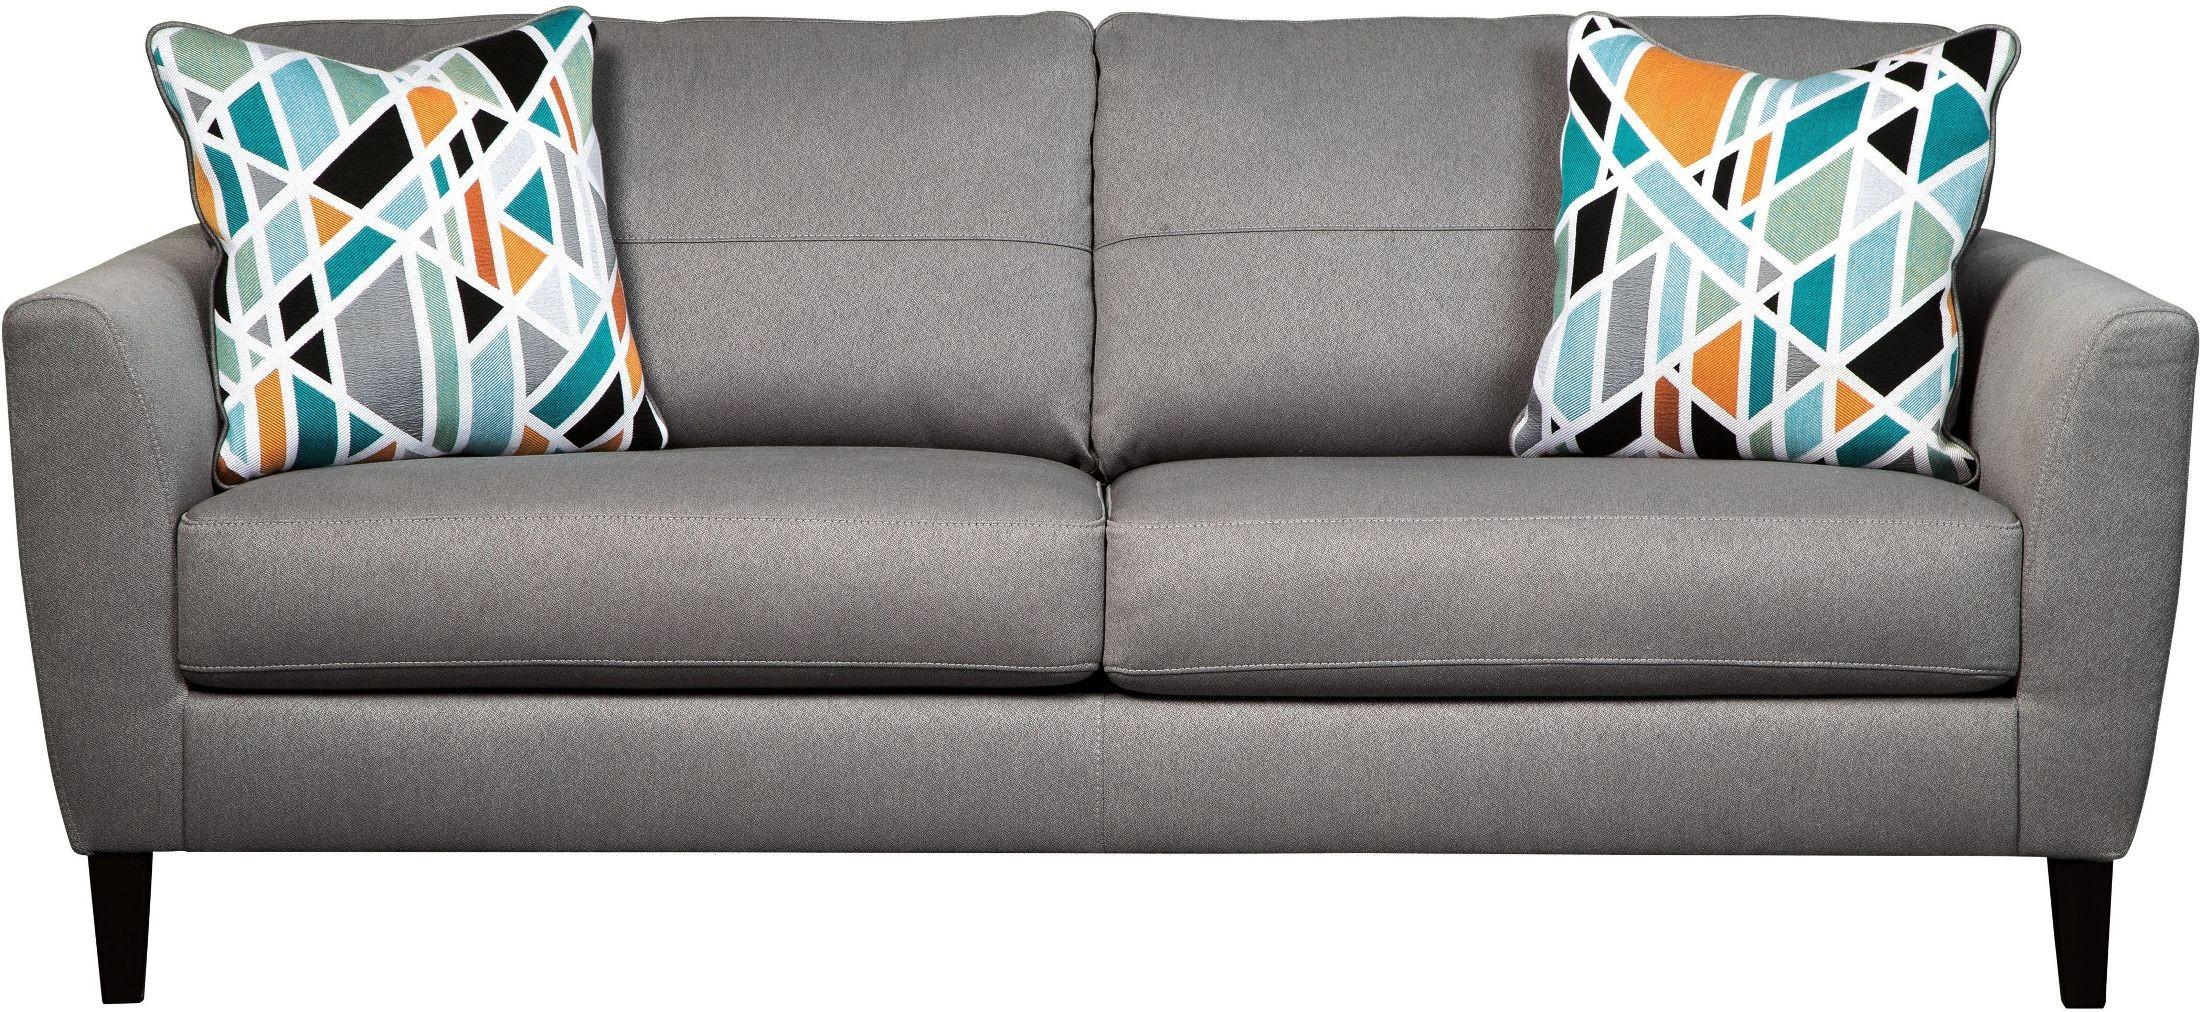 Pelsor Gray Sofa from Ashley